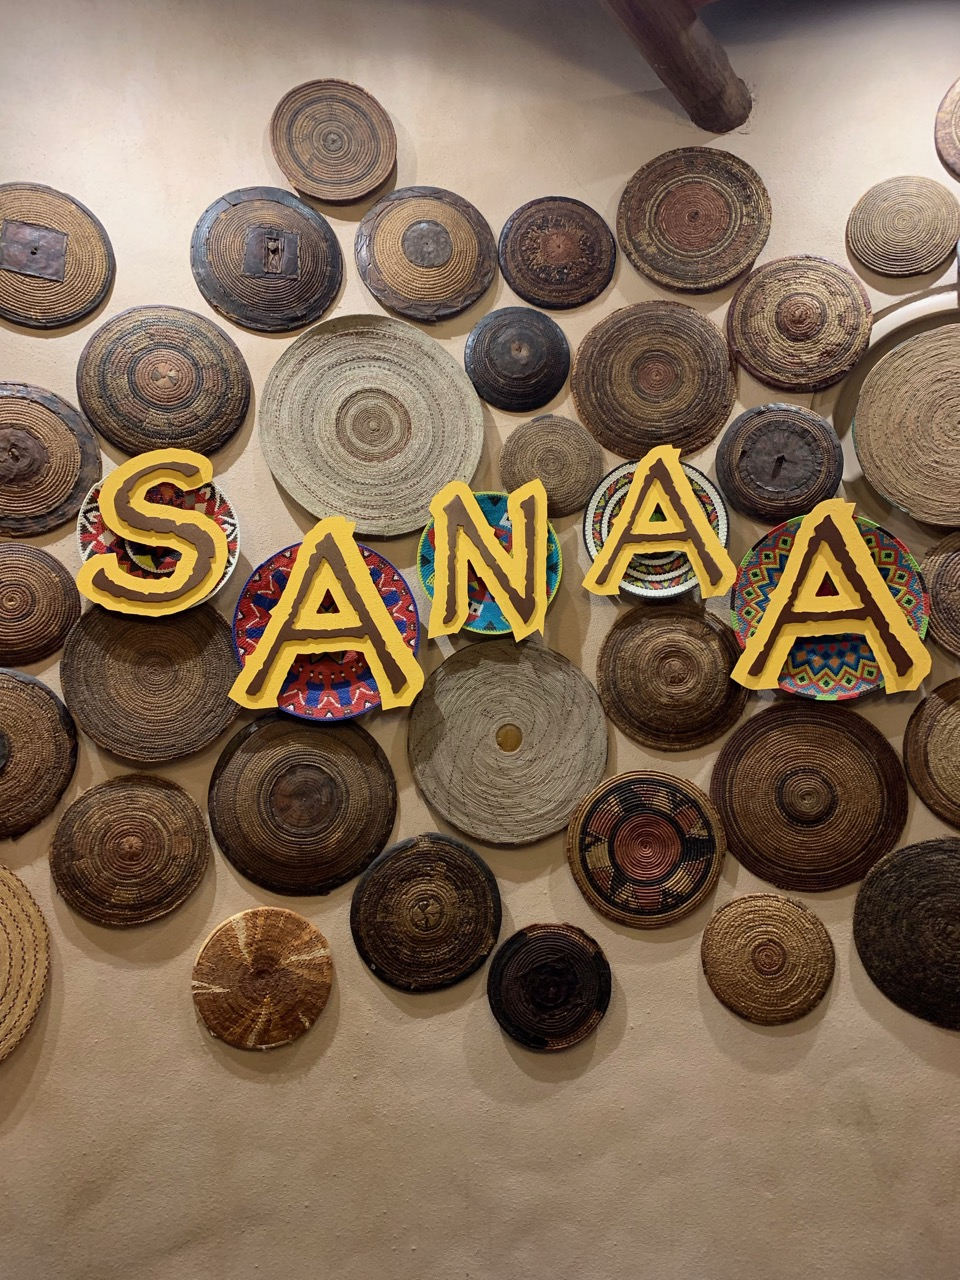 disney world trip report sanaa 01.jpeg